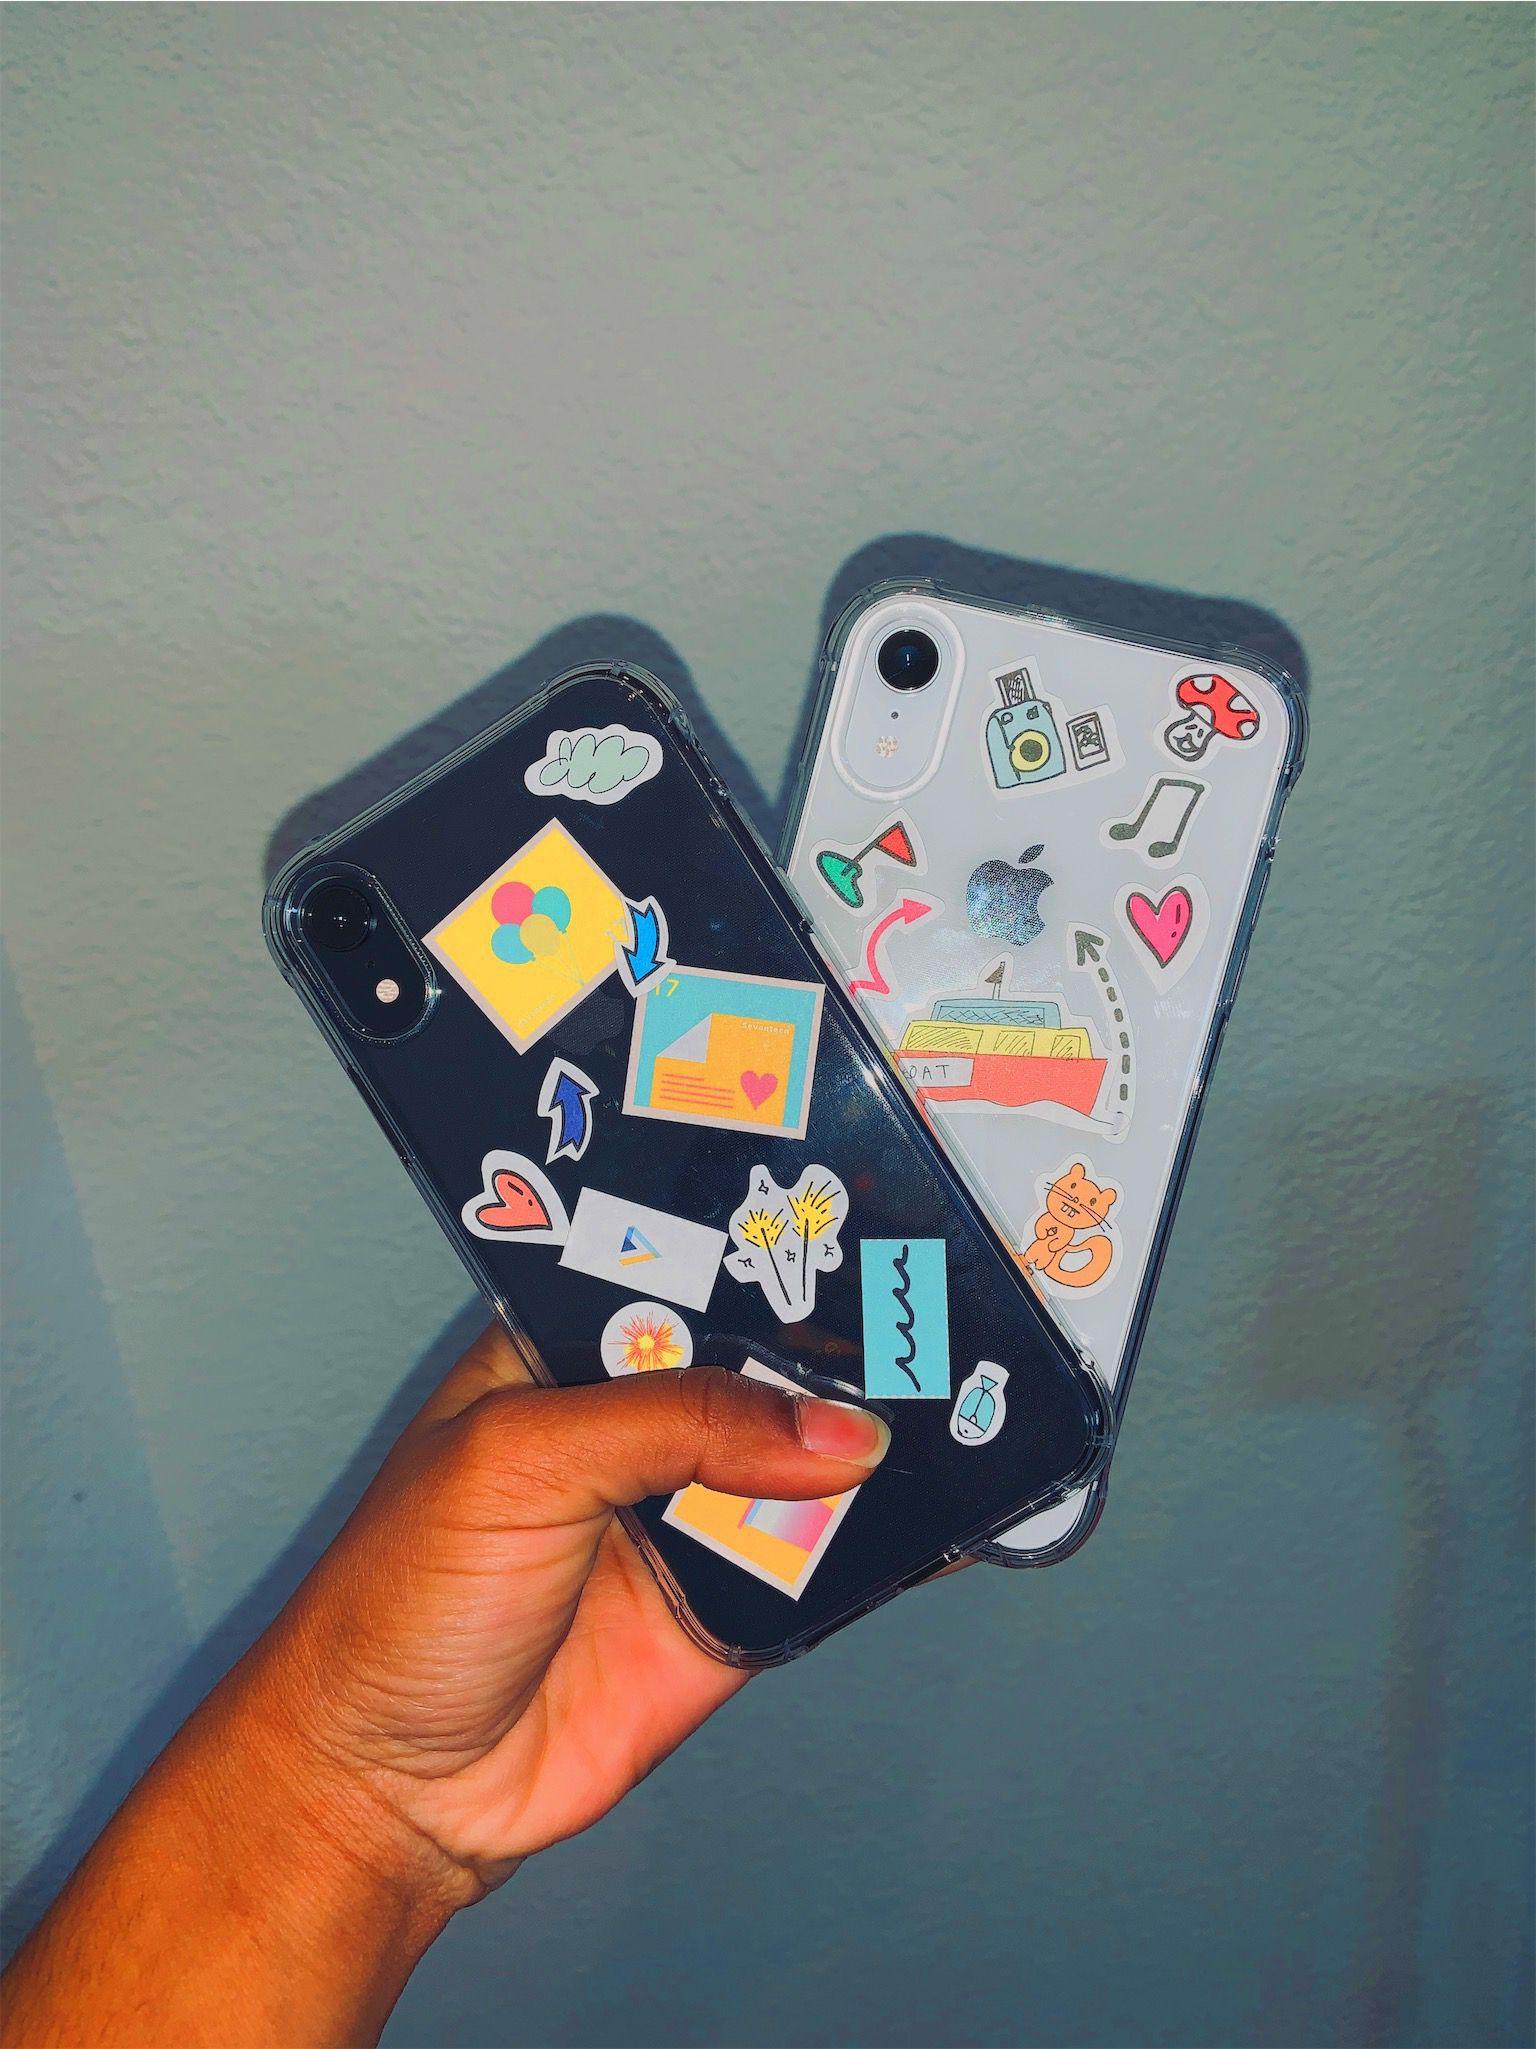 cute phone phonecase aesthetic tumblr vsco xr